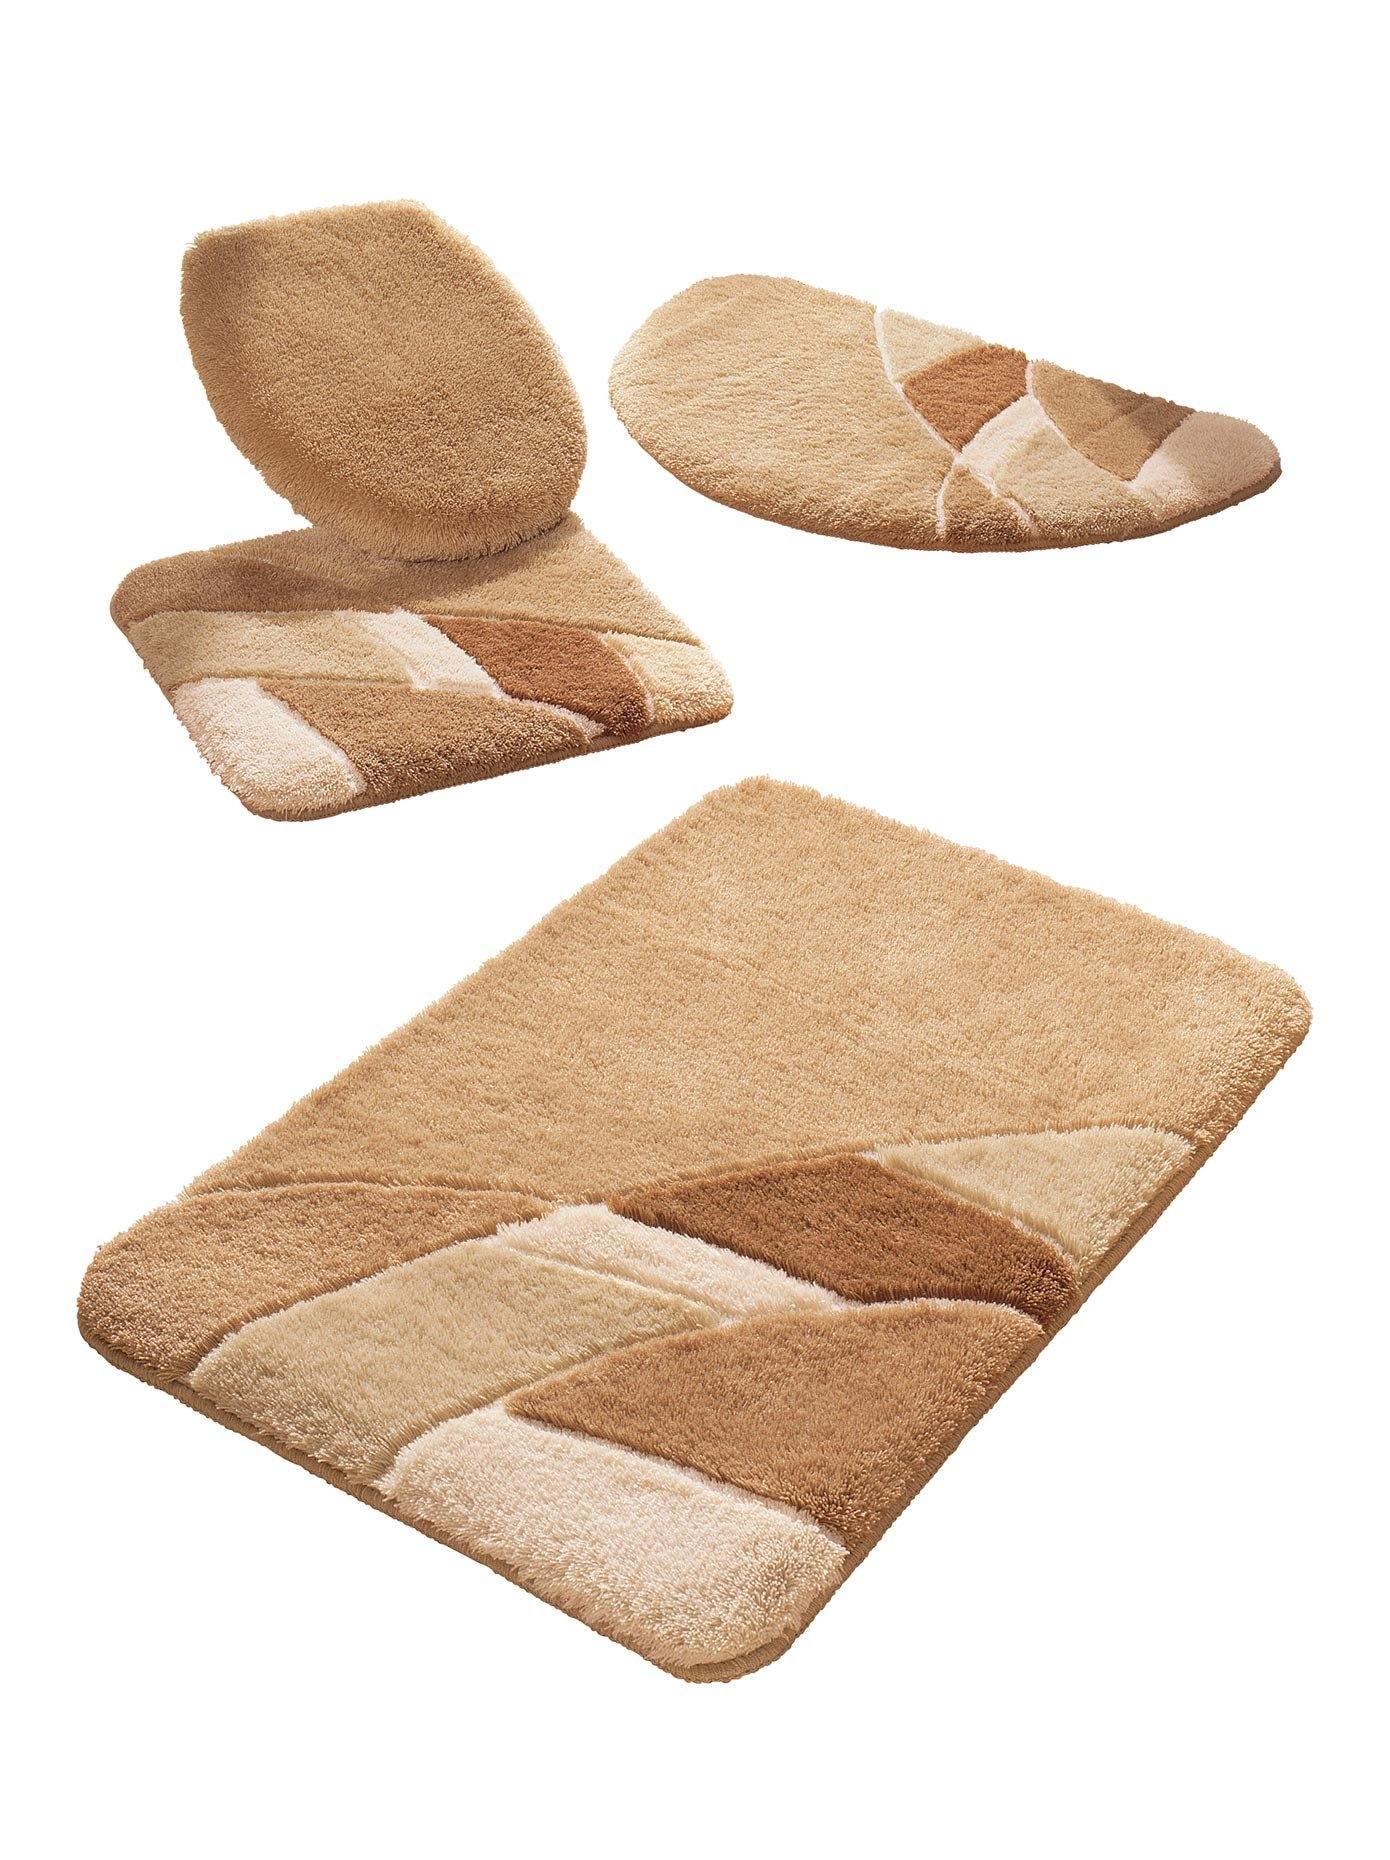 Hagemann badmat (1 stuk) goedkoop op otto.nl kopen